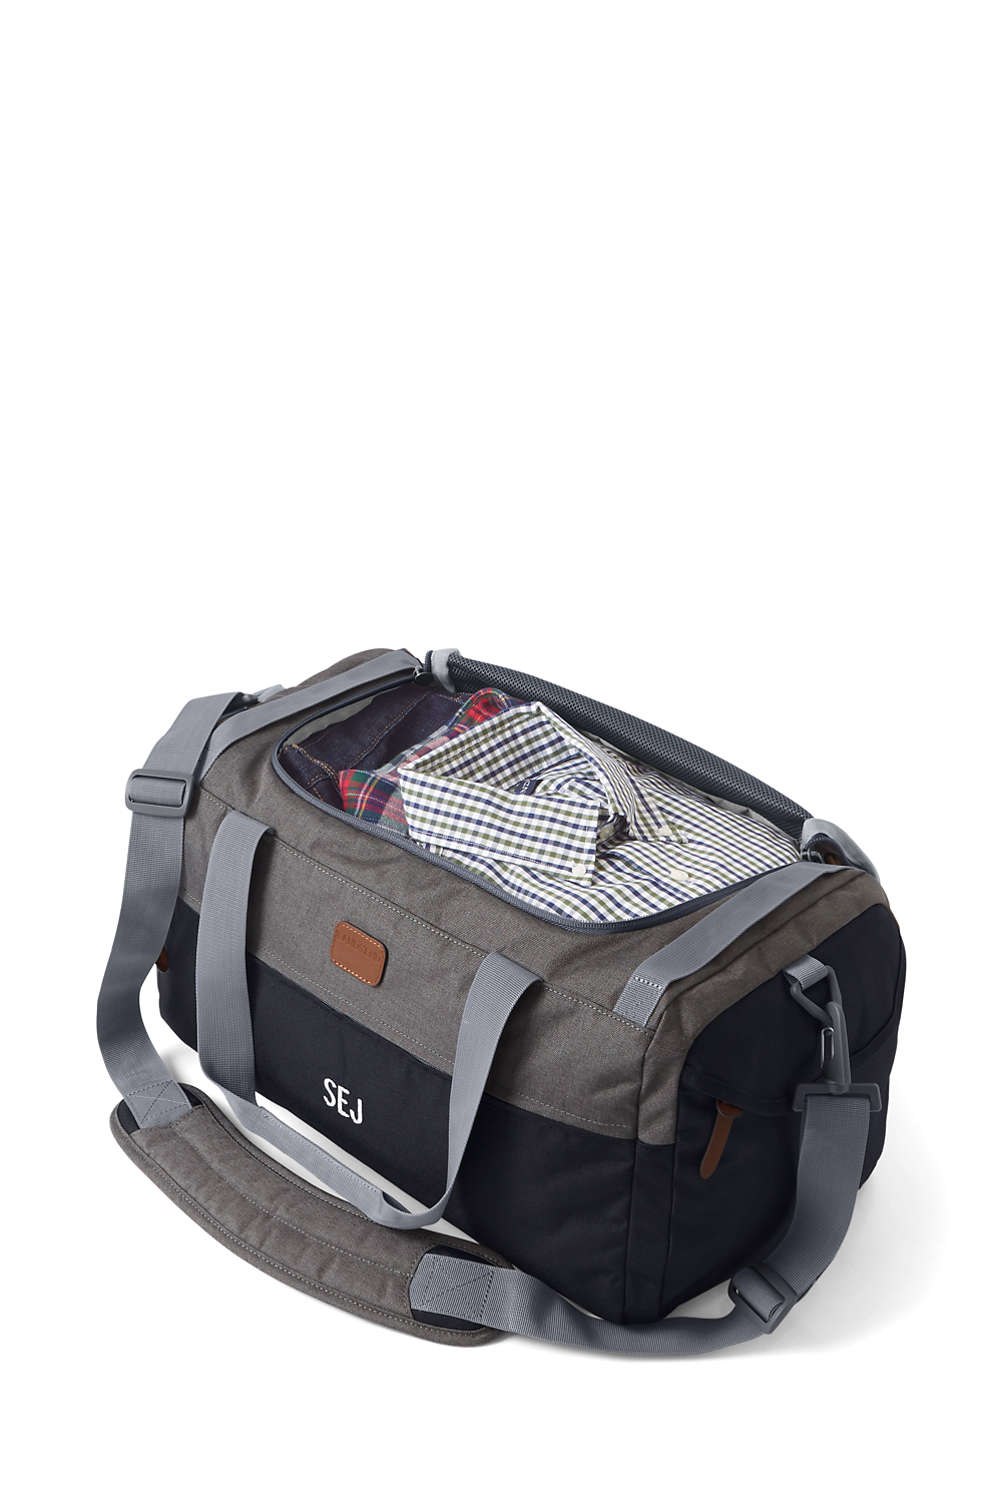 46e83edb2070 School Uniform Small Everyday Duffle Bag from Lands  End